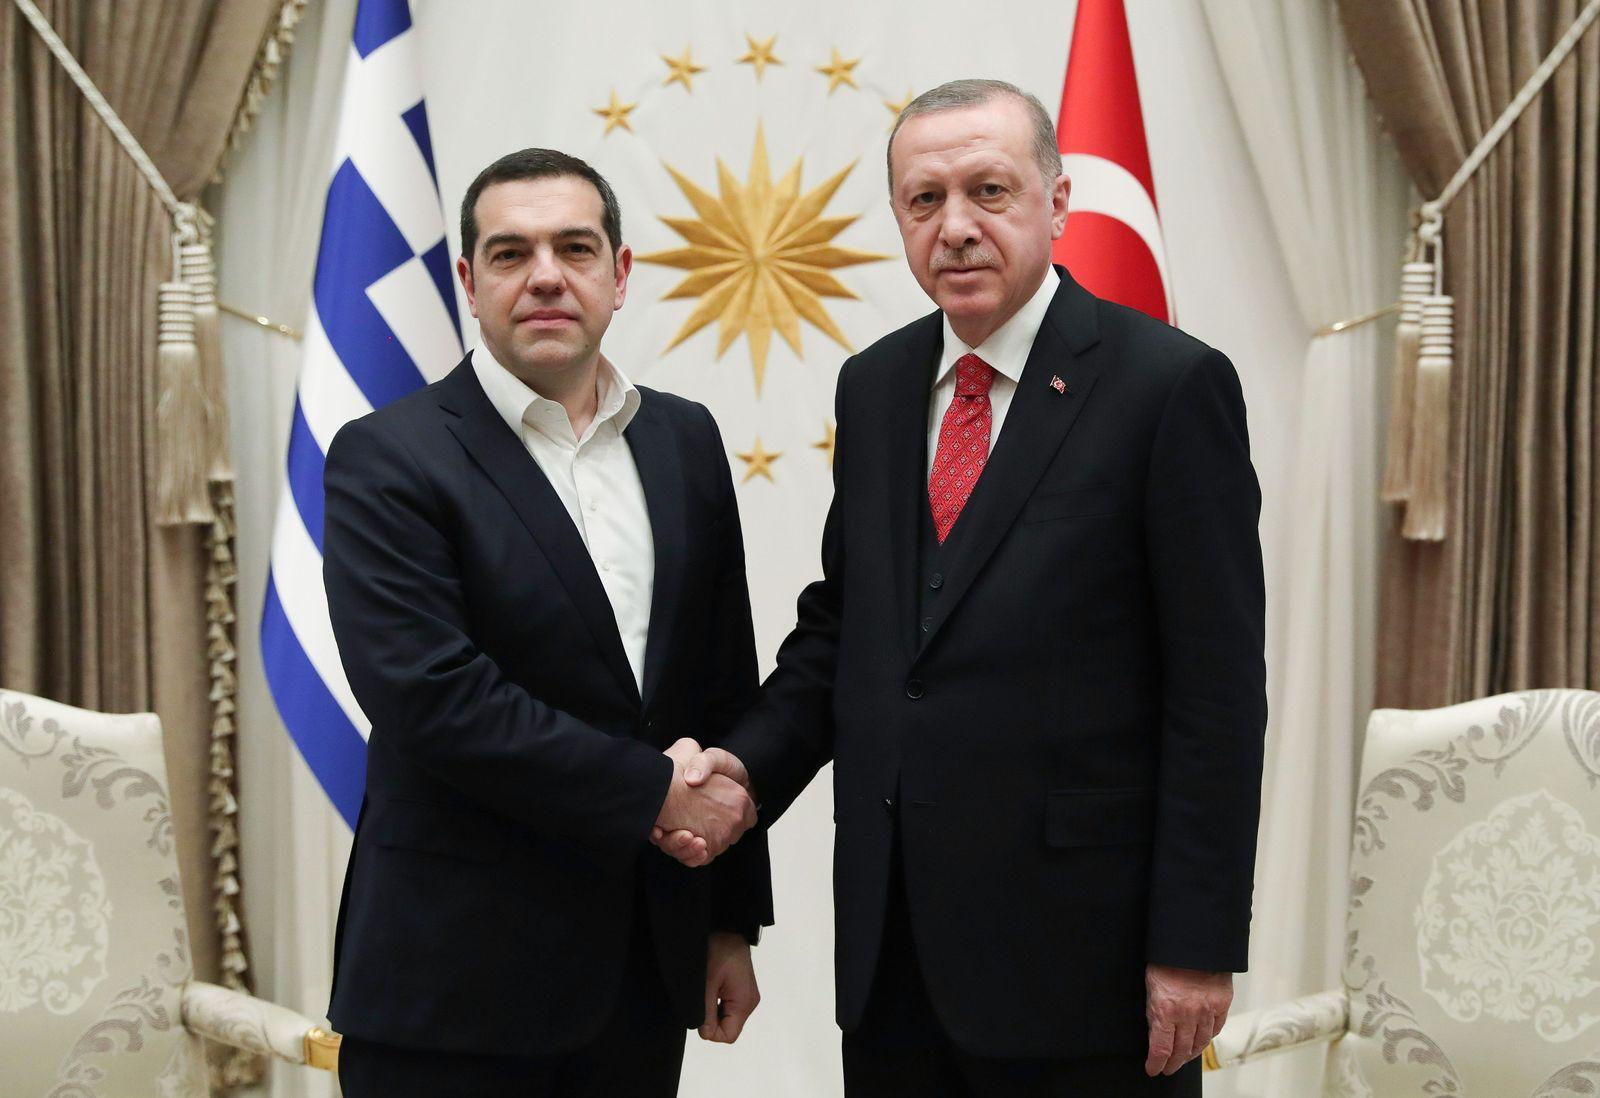 Alexis Tsipras/ Recep Tayyip Erdogan